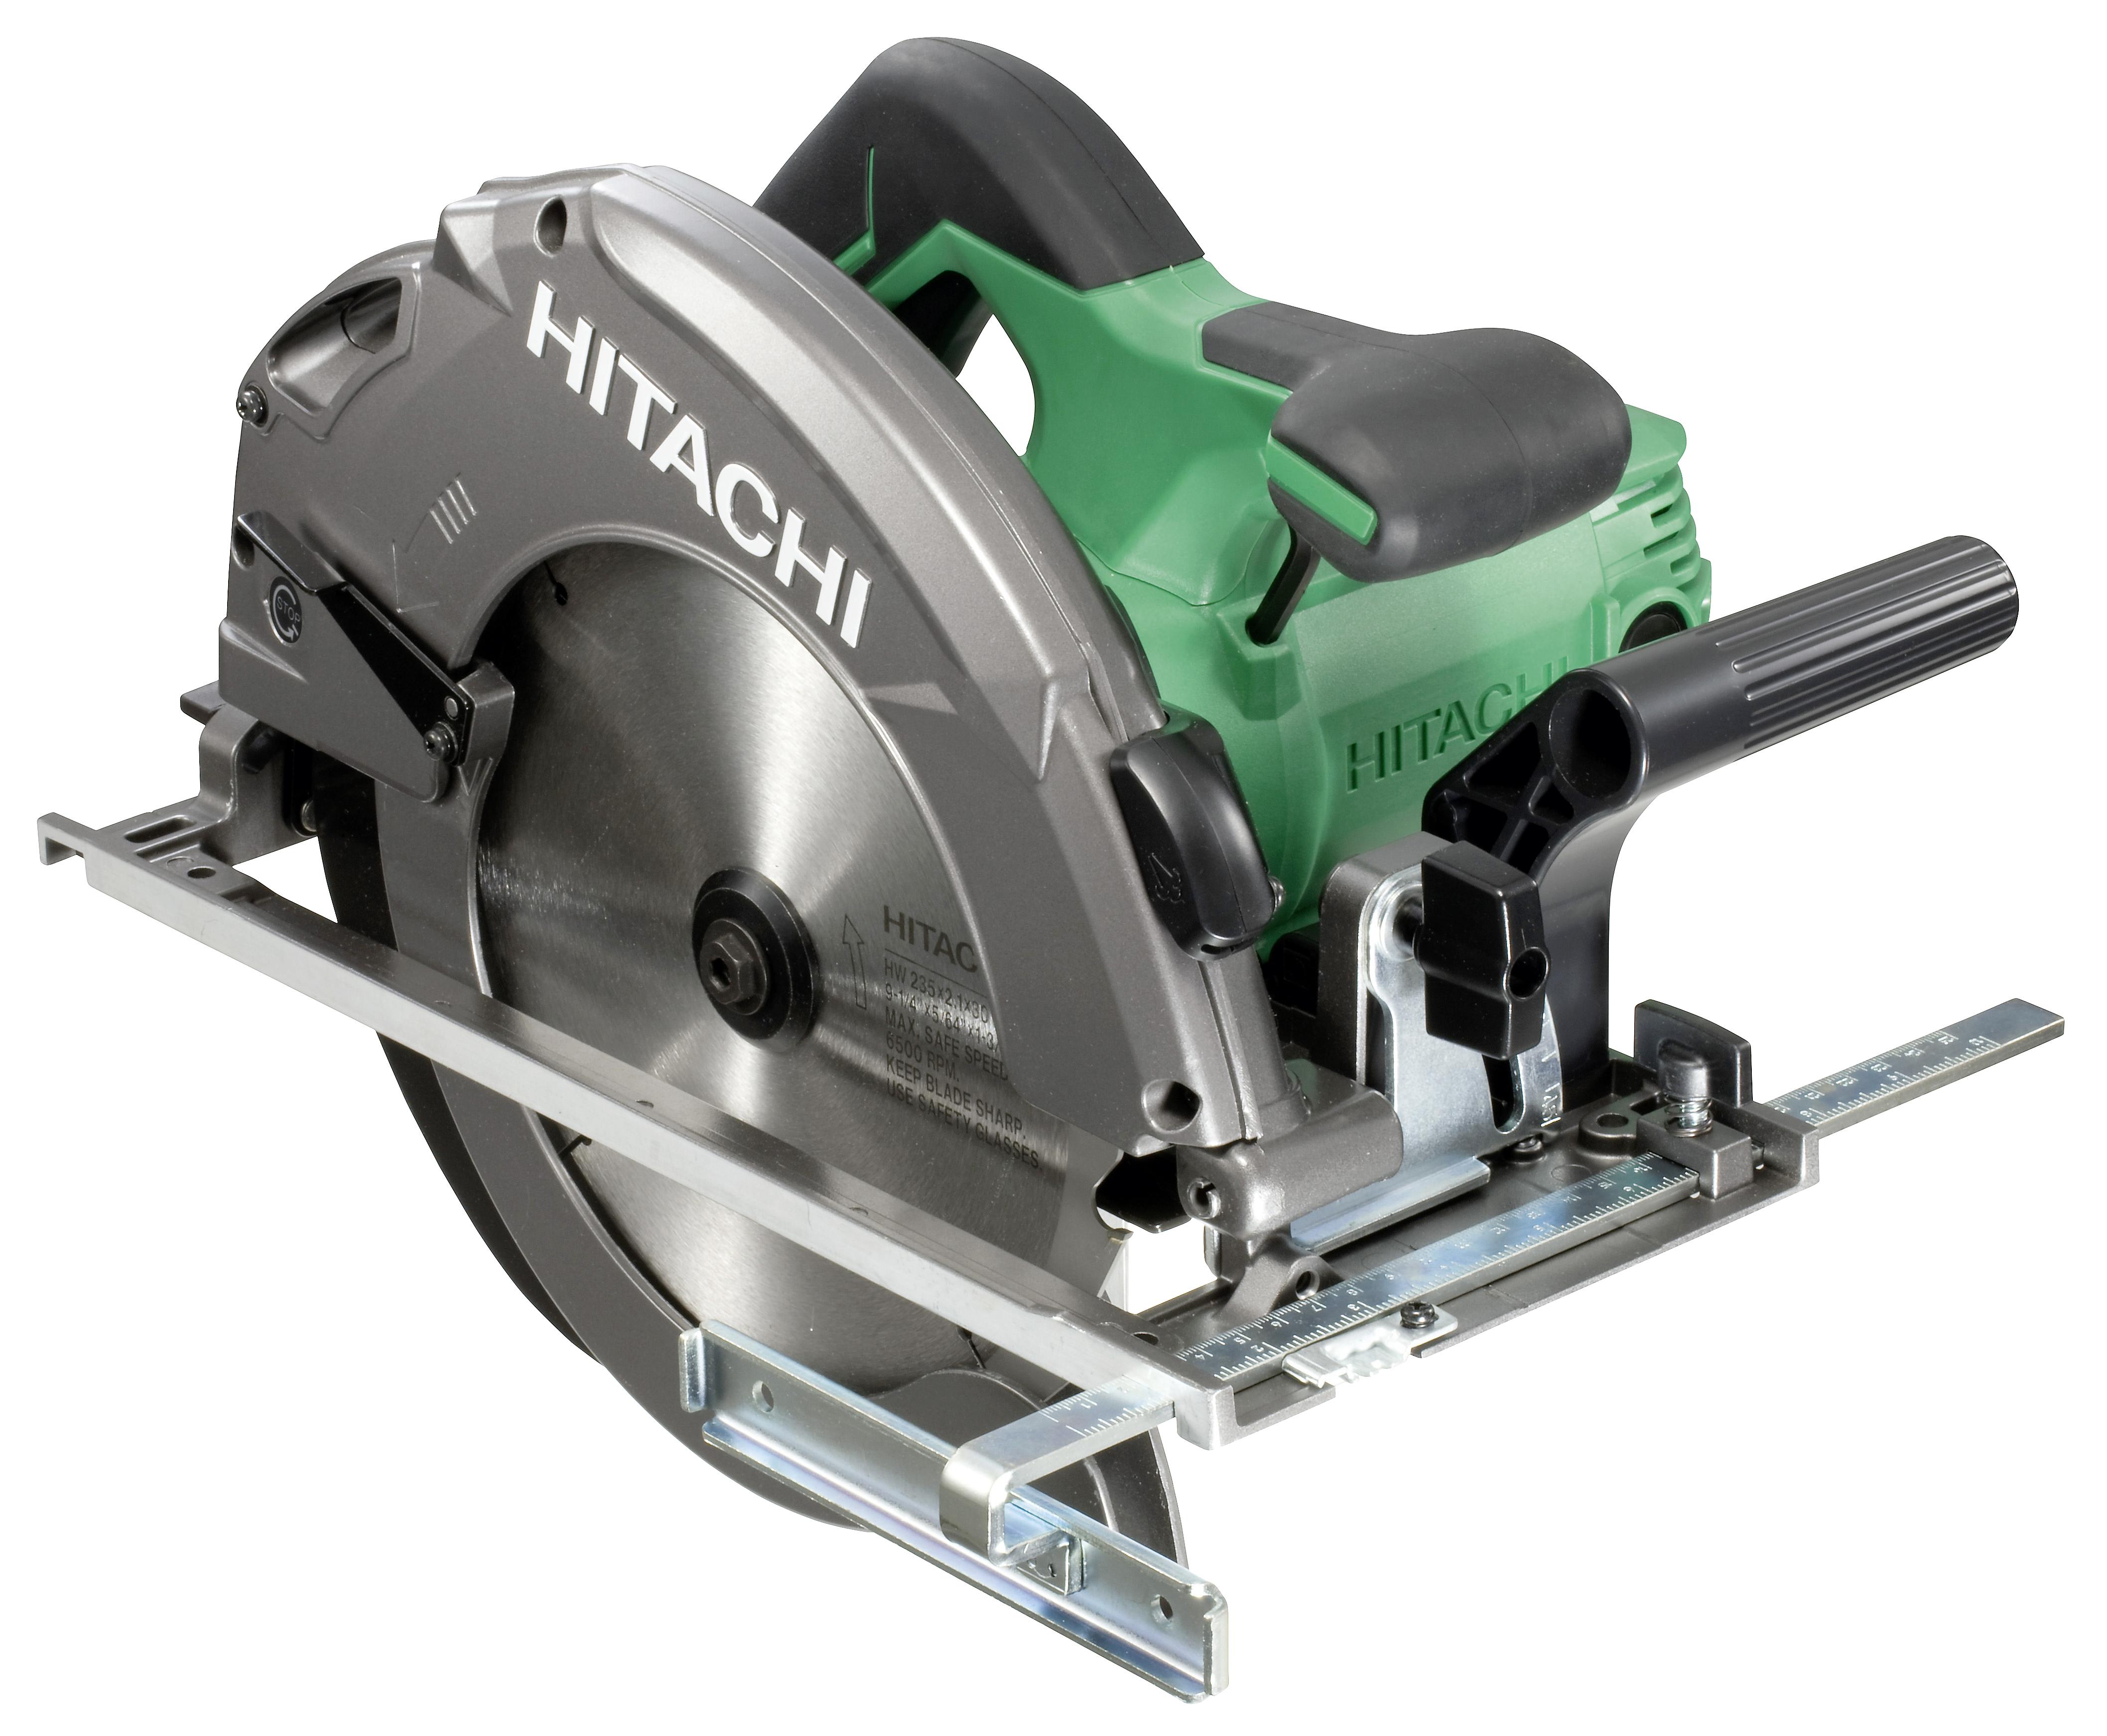 C9BU3-Circular-Saw-235mm-2000W-w-_-Case-and-Electronic-Brake